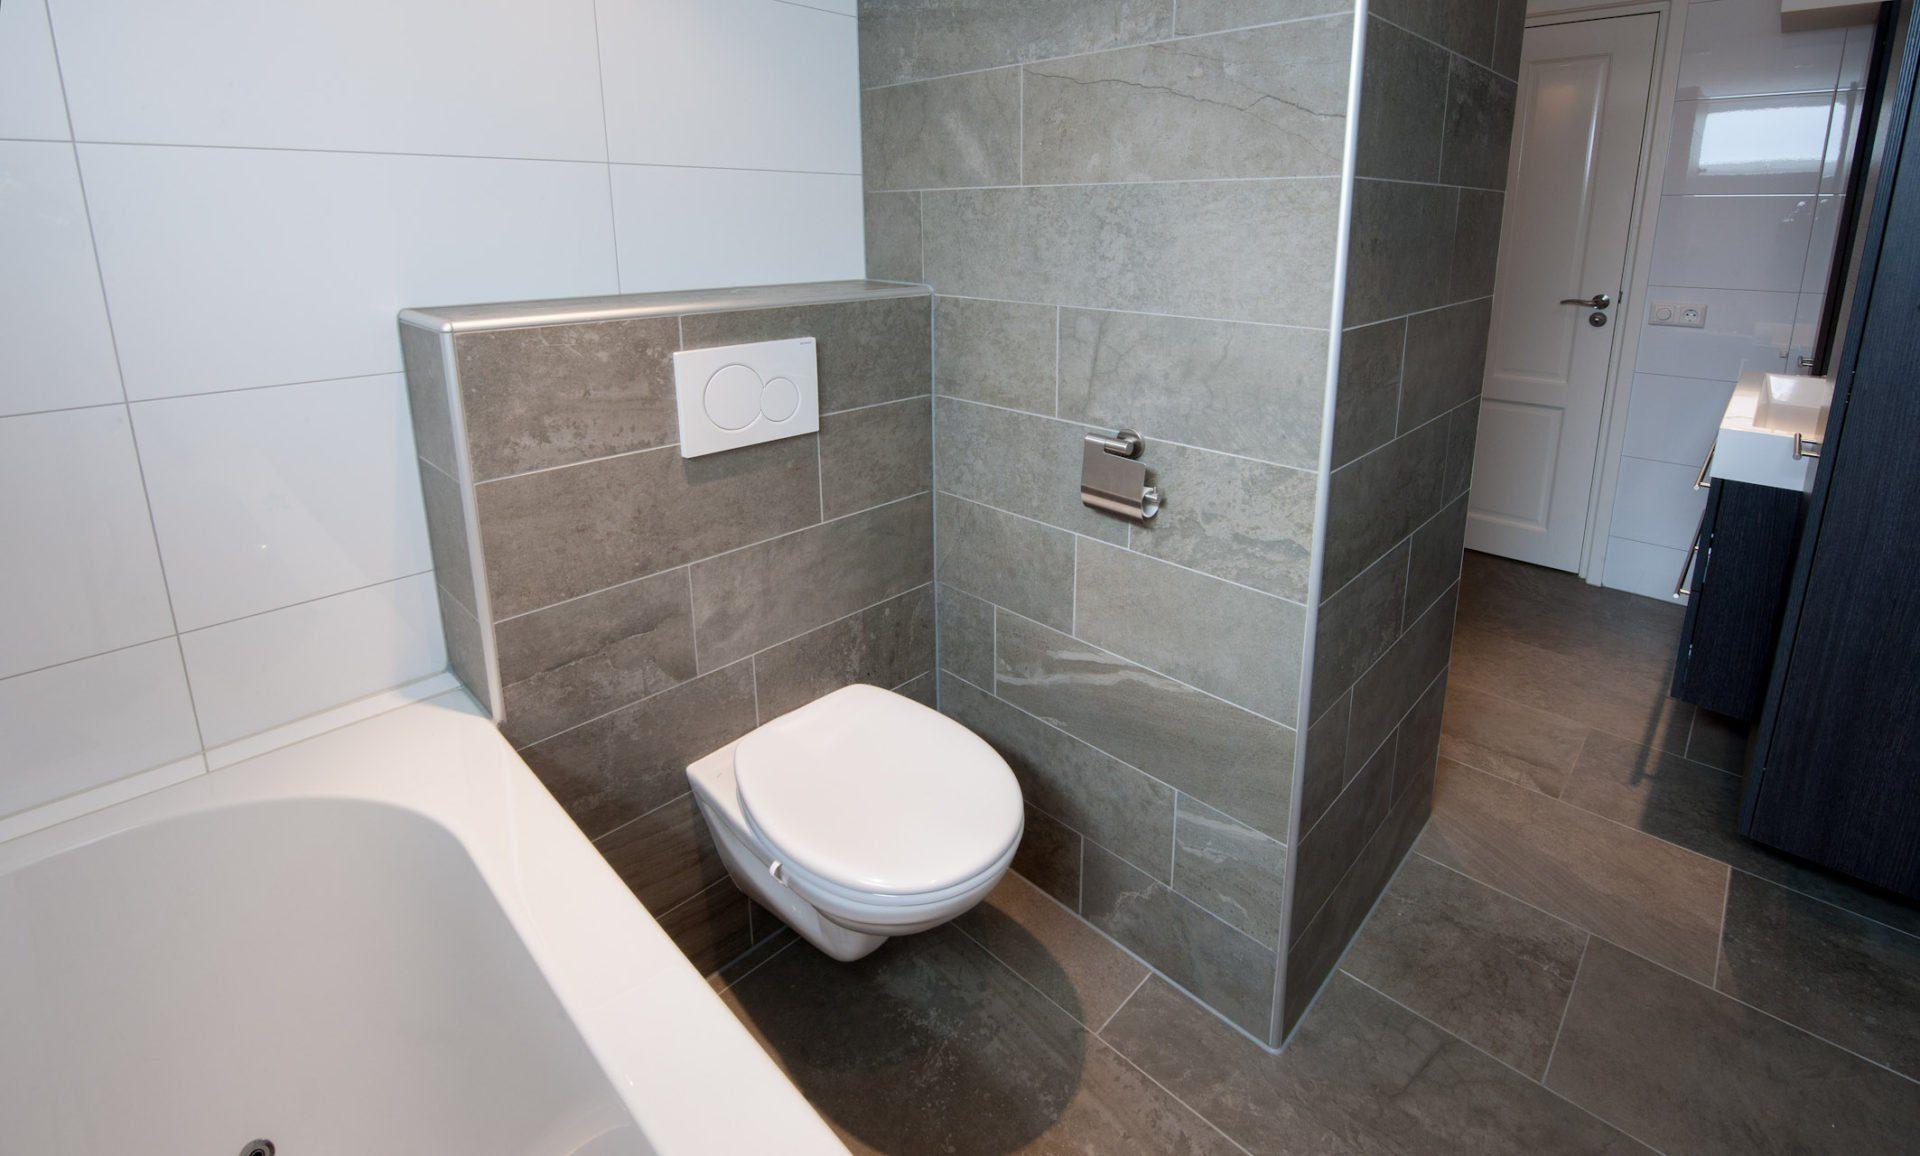 Badkamer Showroom Leerdam : Groot formaat vloertegels in hal en badkamer kroon vloeren in steen